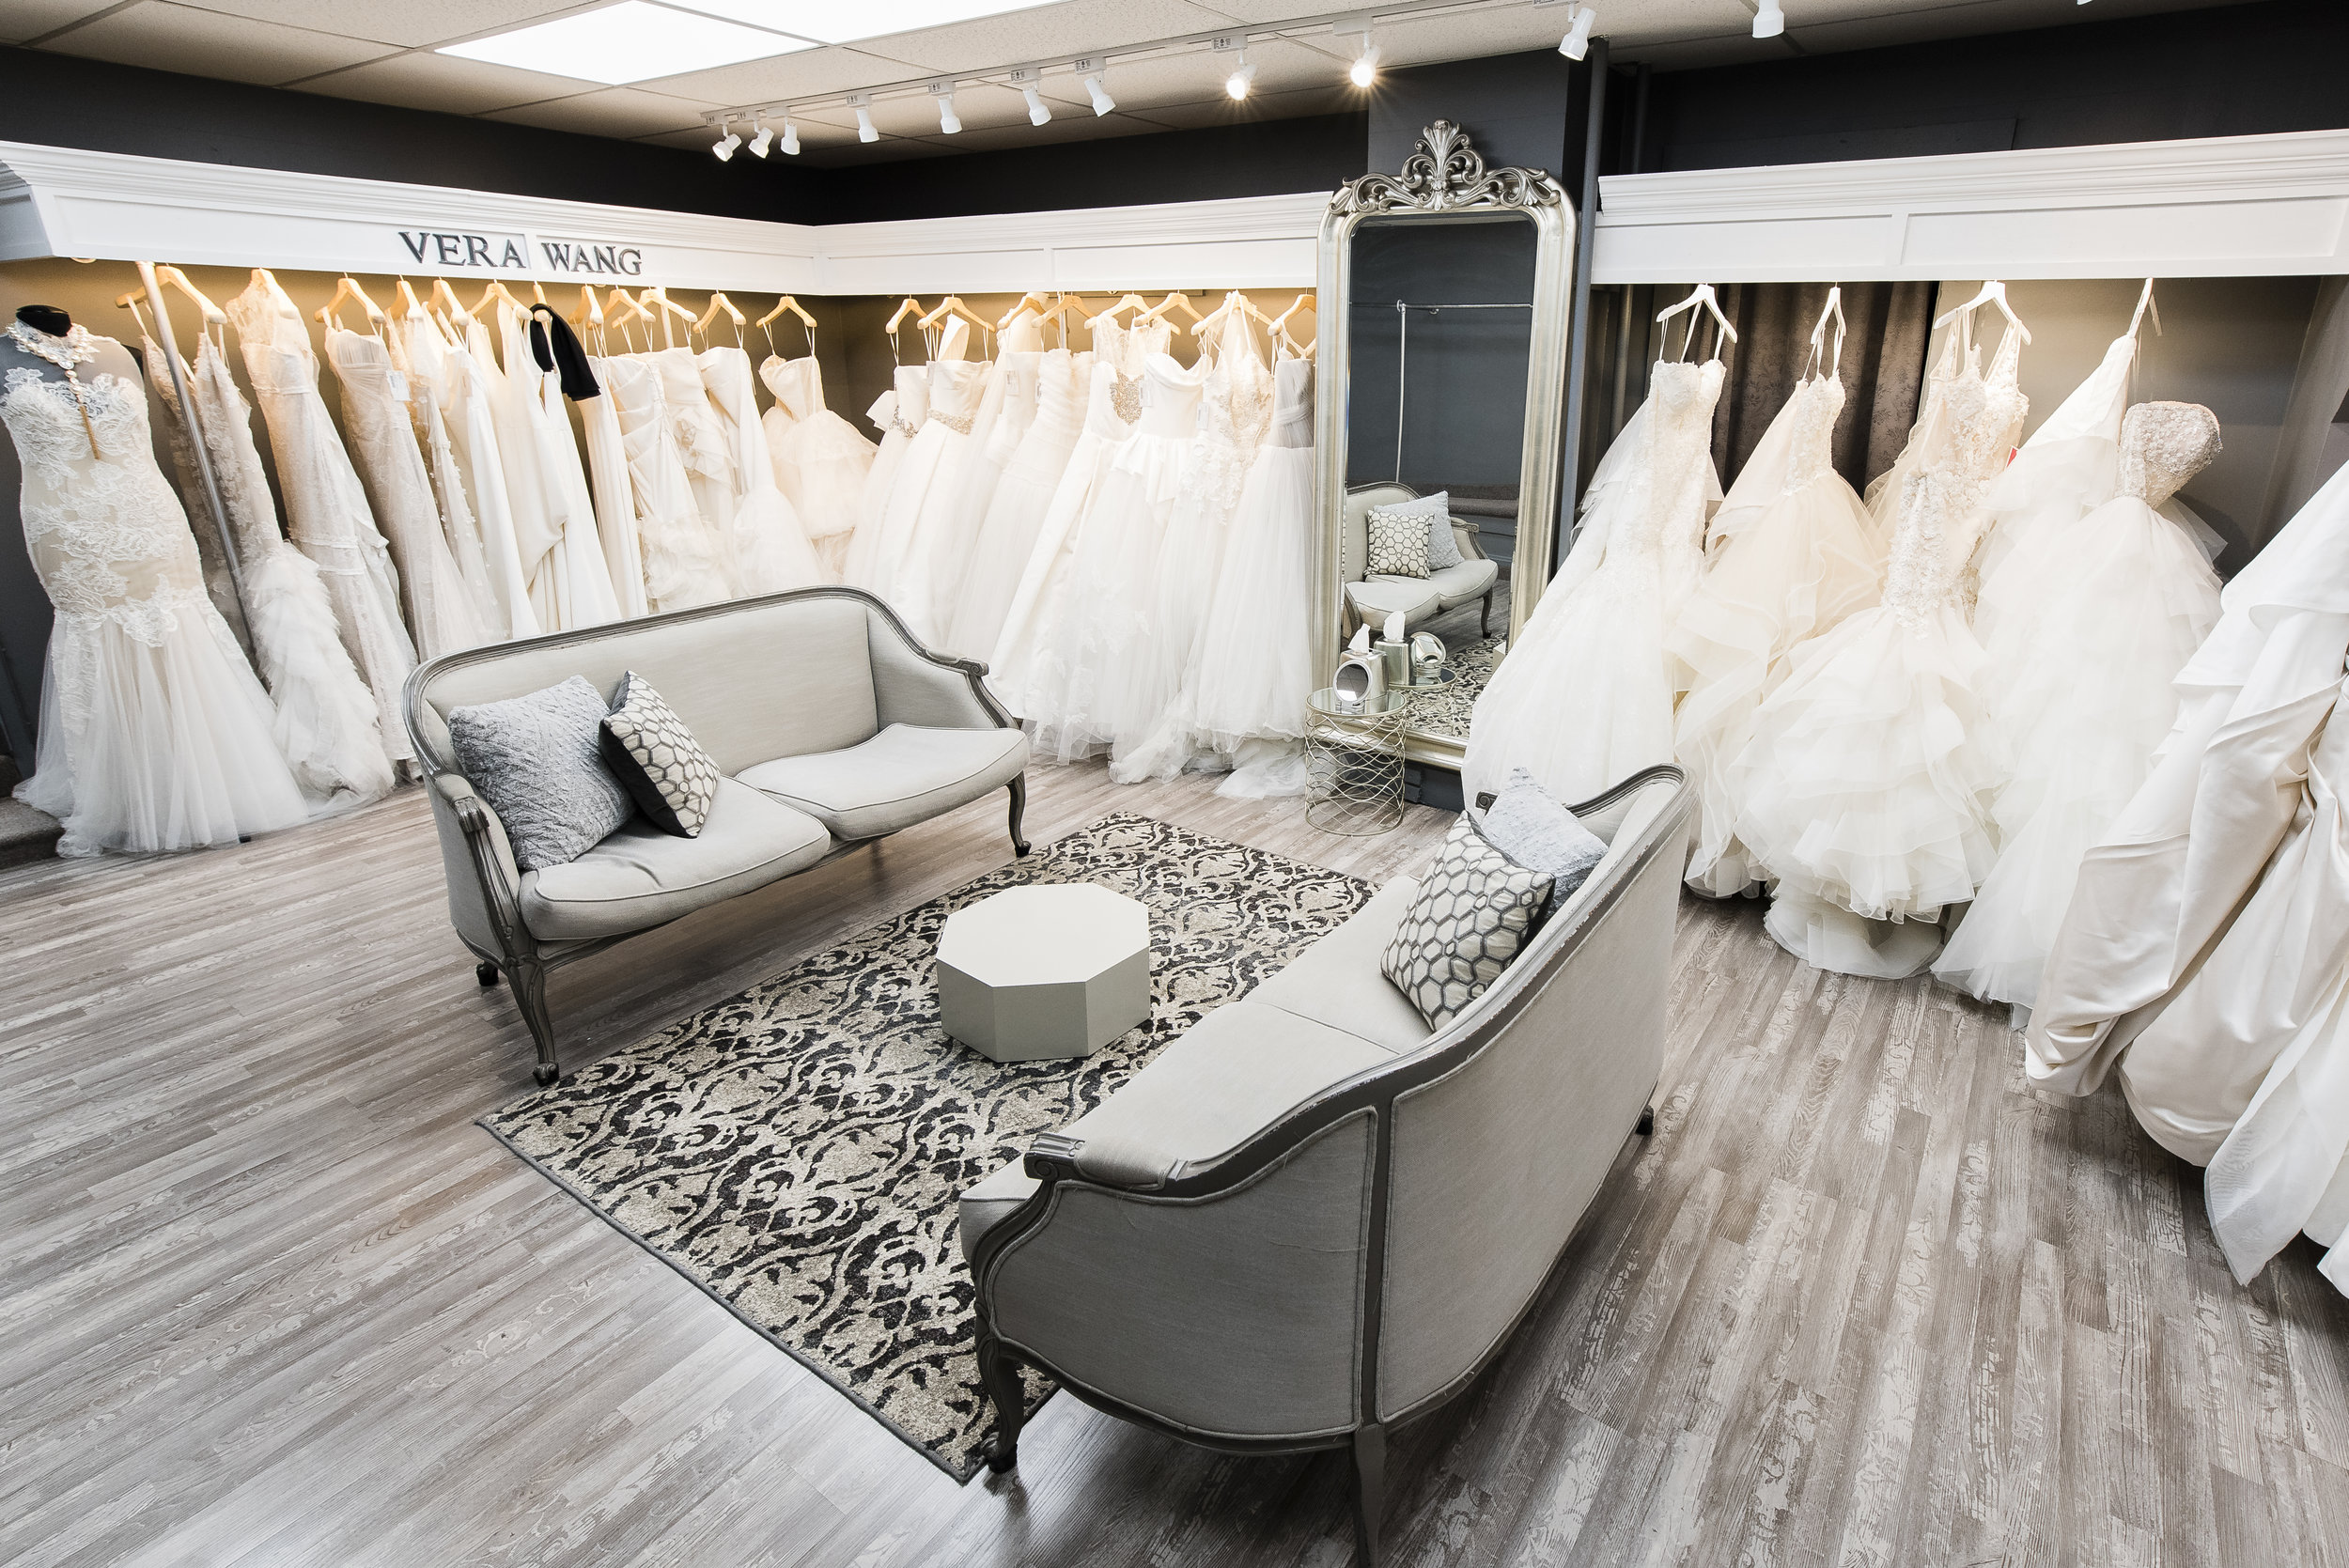 Bridal & Formal - Shot by Allen Meyer-1.JPG